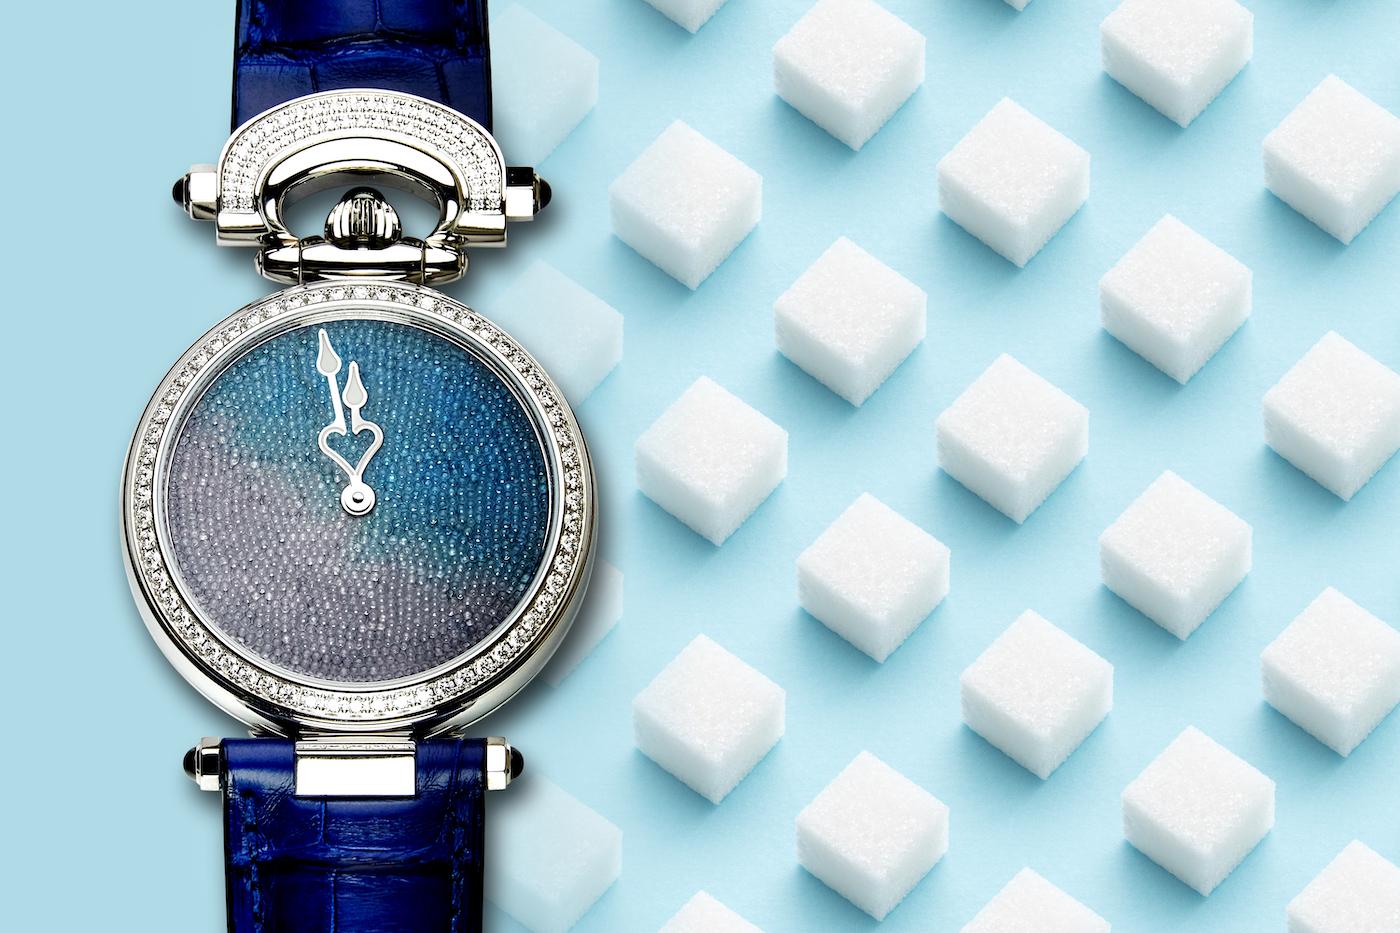 Sugar coating: Bovet's Miss Audrey Sweet Art